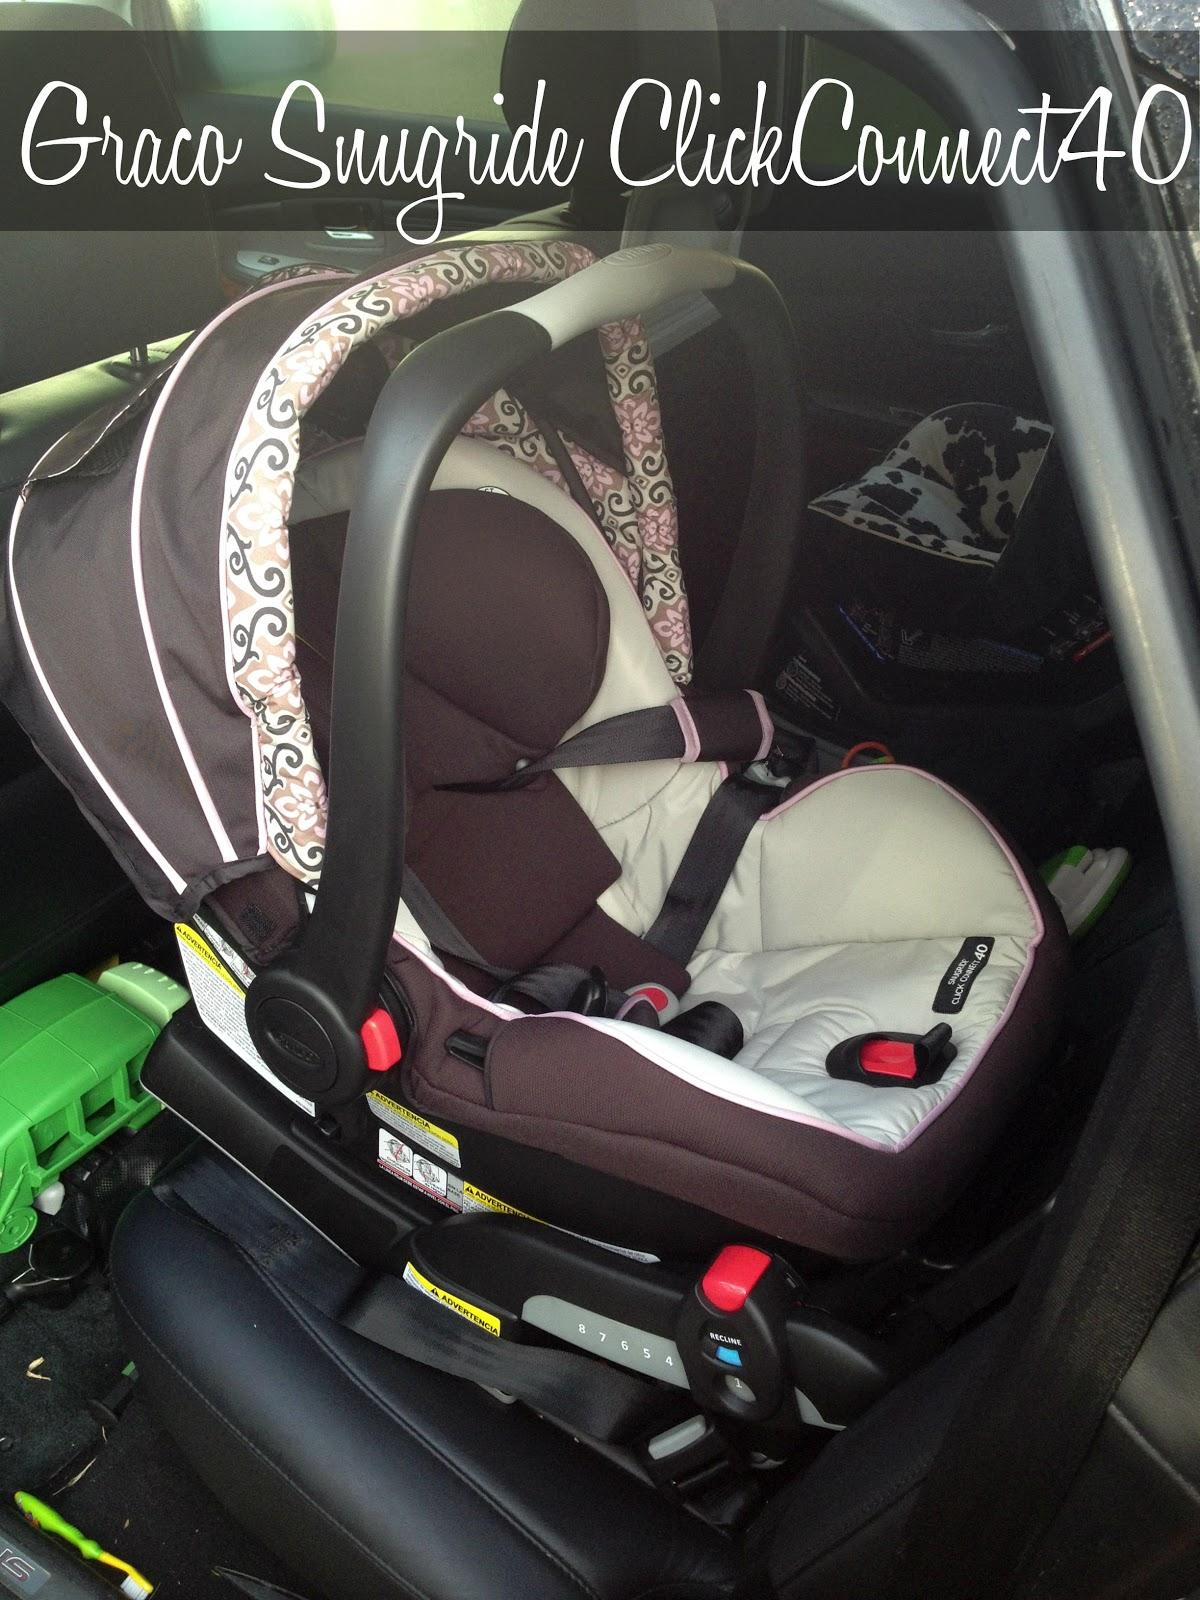 Snugride Car Seat Reviews